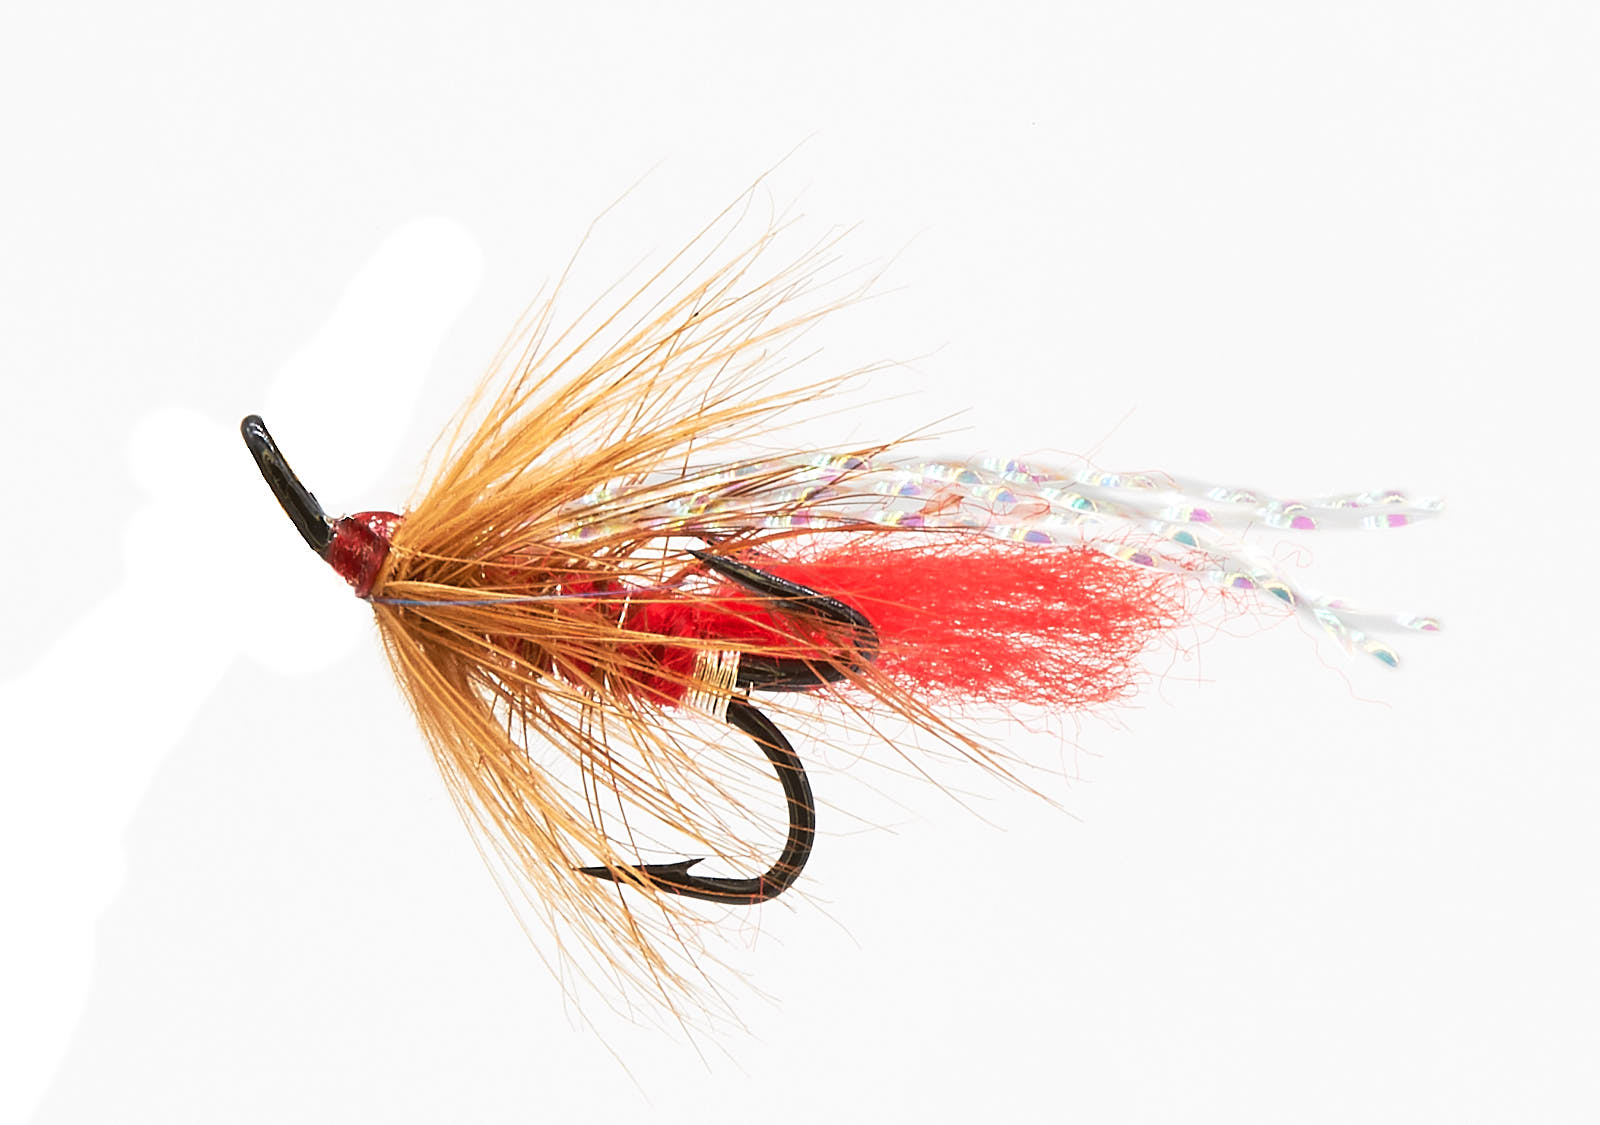 Soldier Palmer Treble Hook # 12